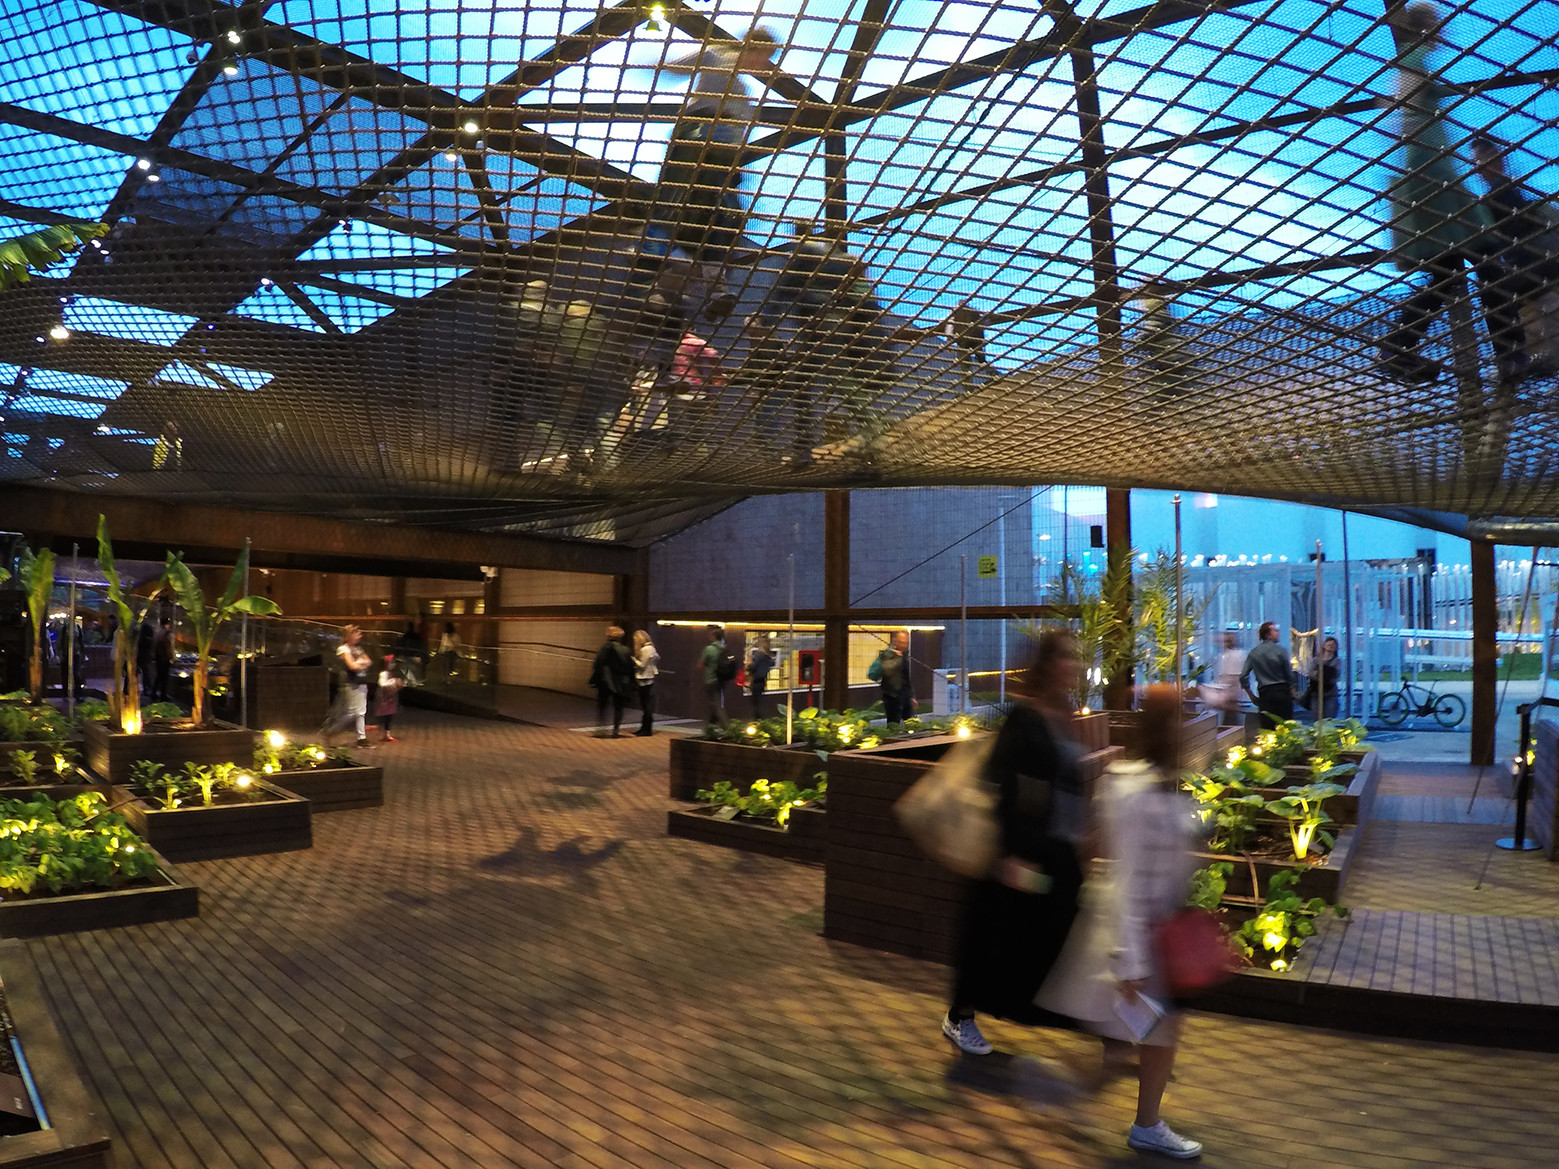 Brazil_Pavilion_-_AtelierMarkoBrajovic_12